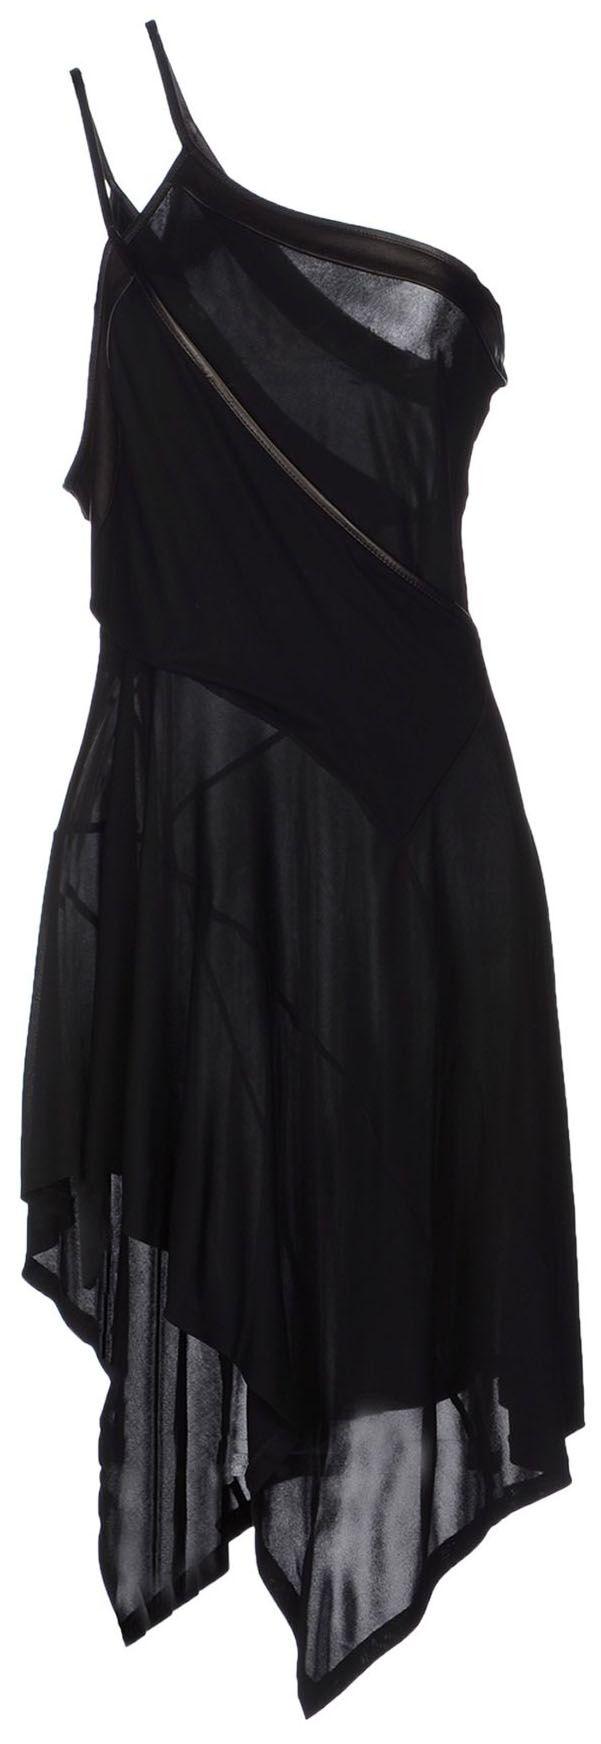 Barbara bui short asymmetrical hemline black dress pins and